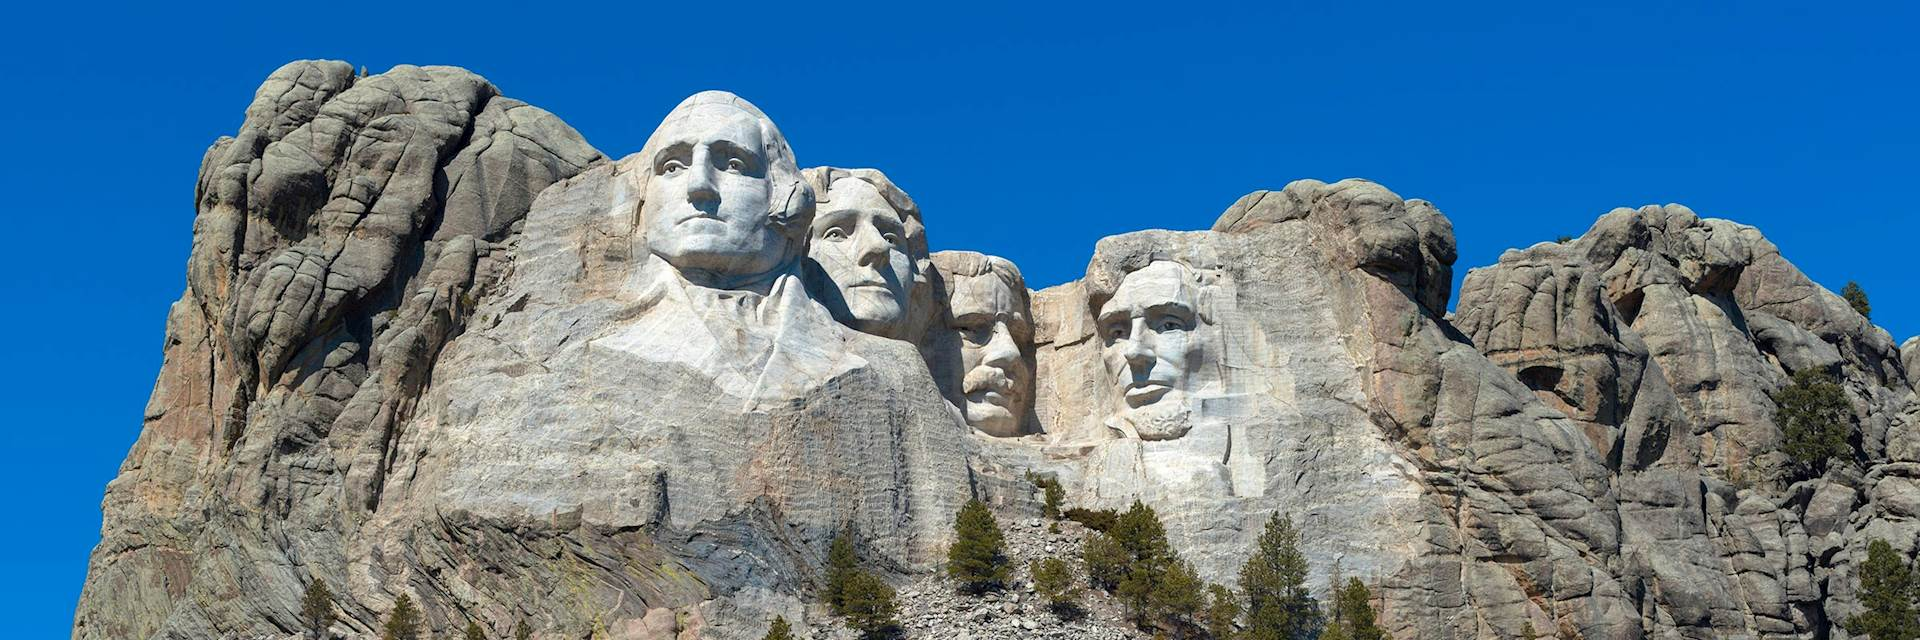 Mount Rushmore National Memorial, USA